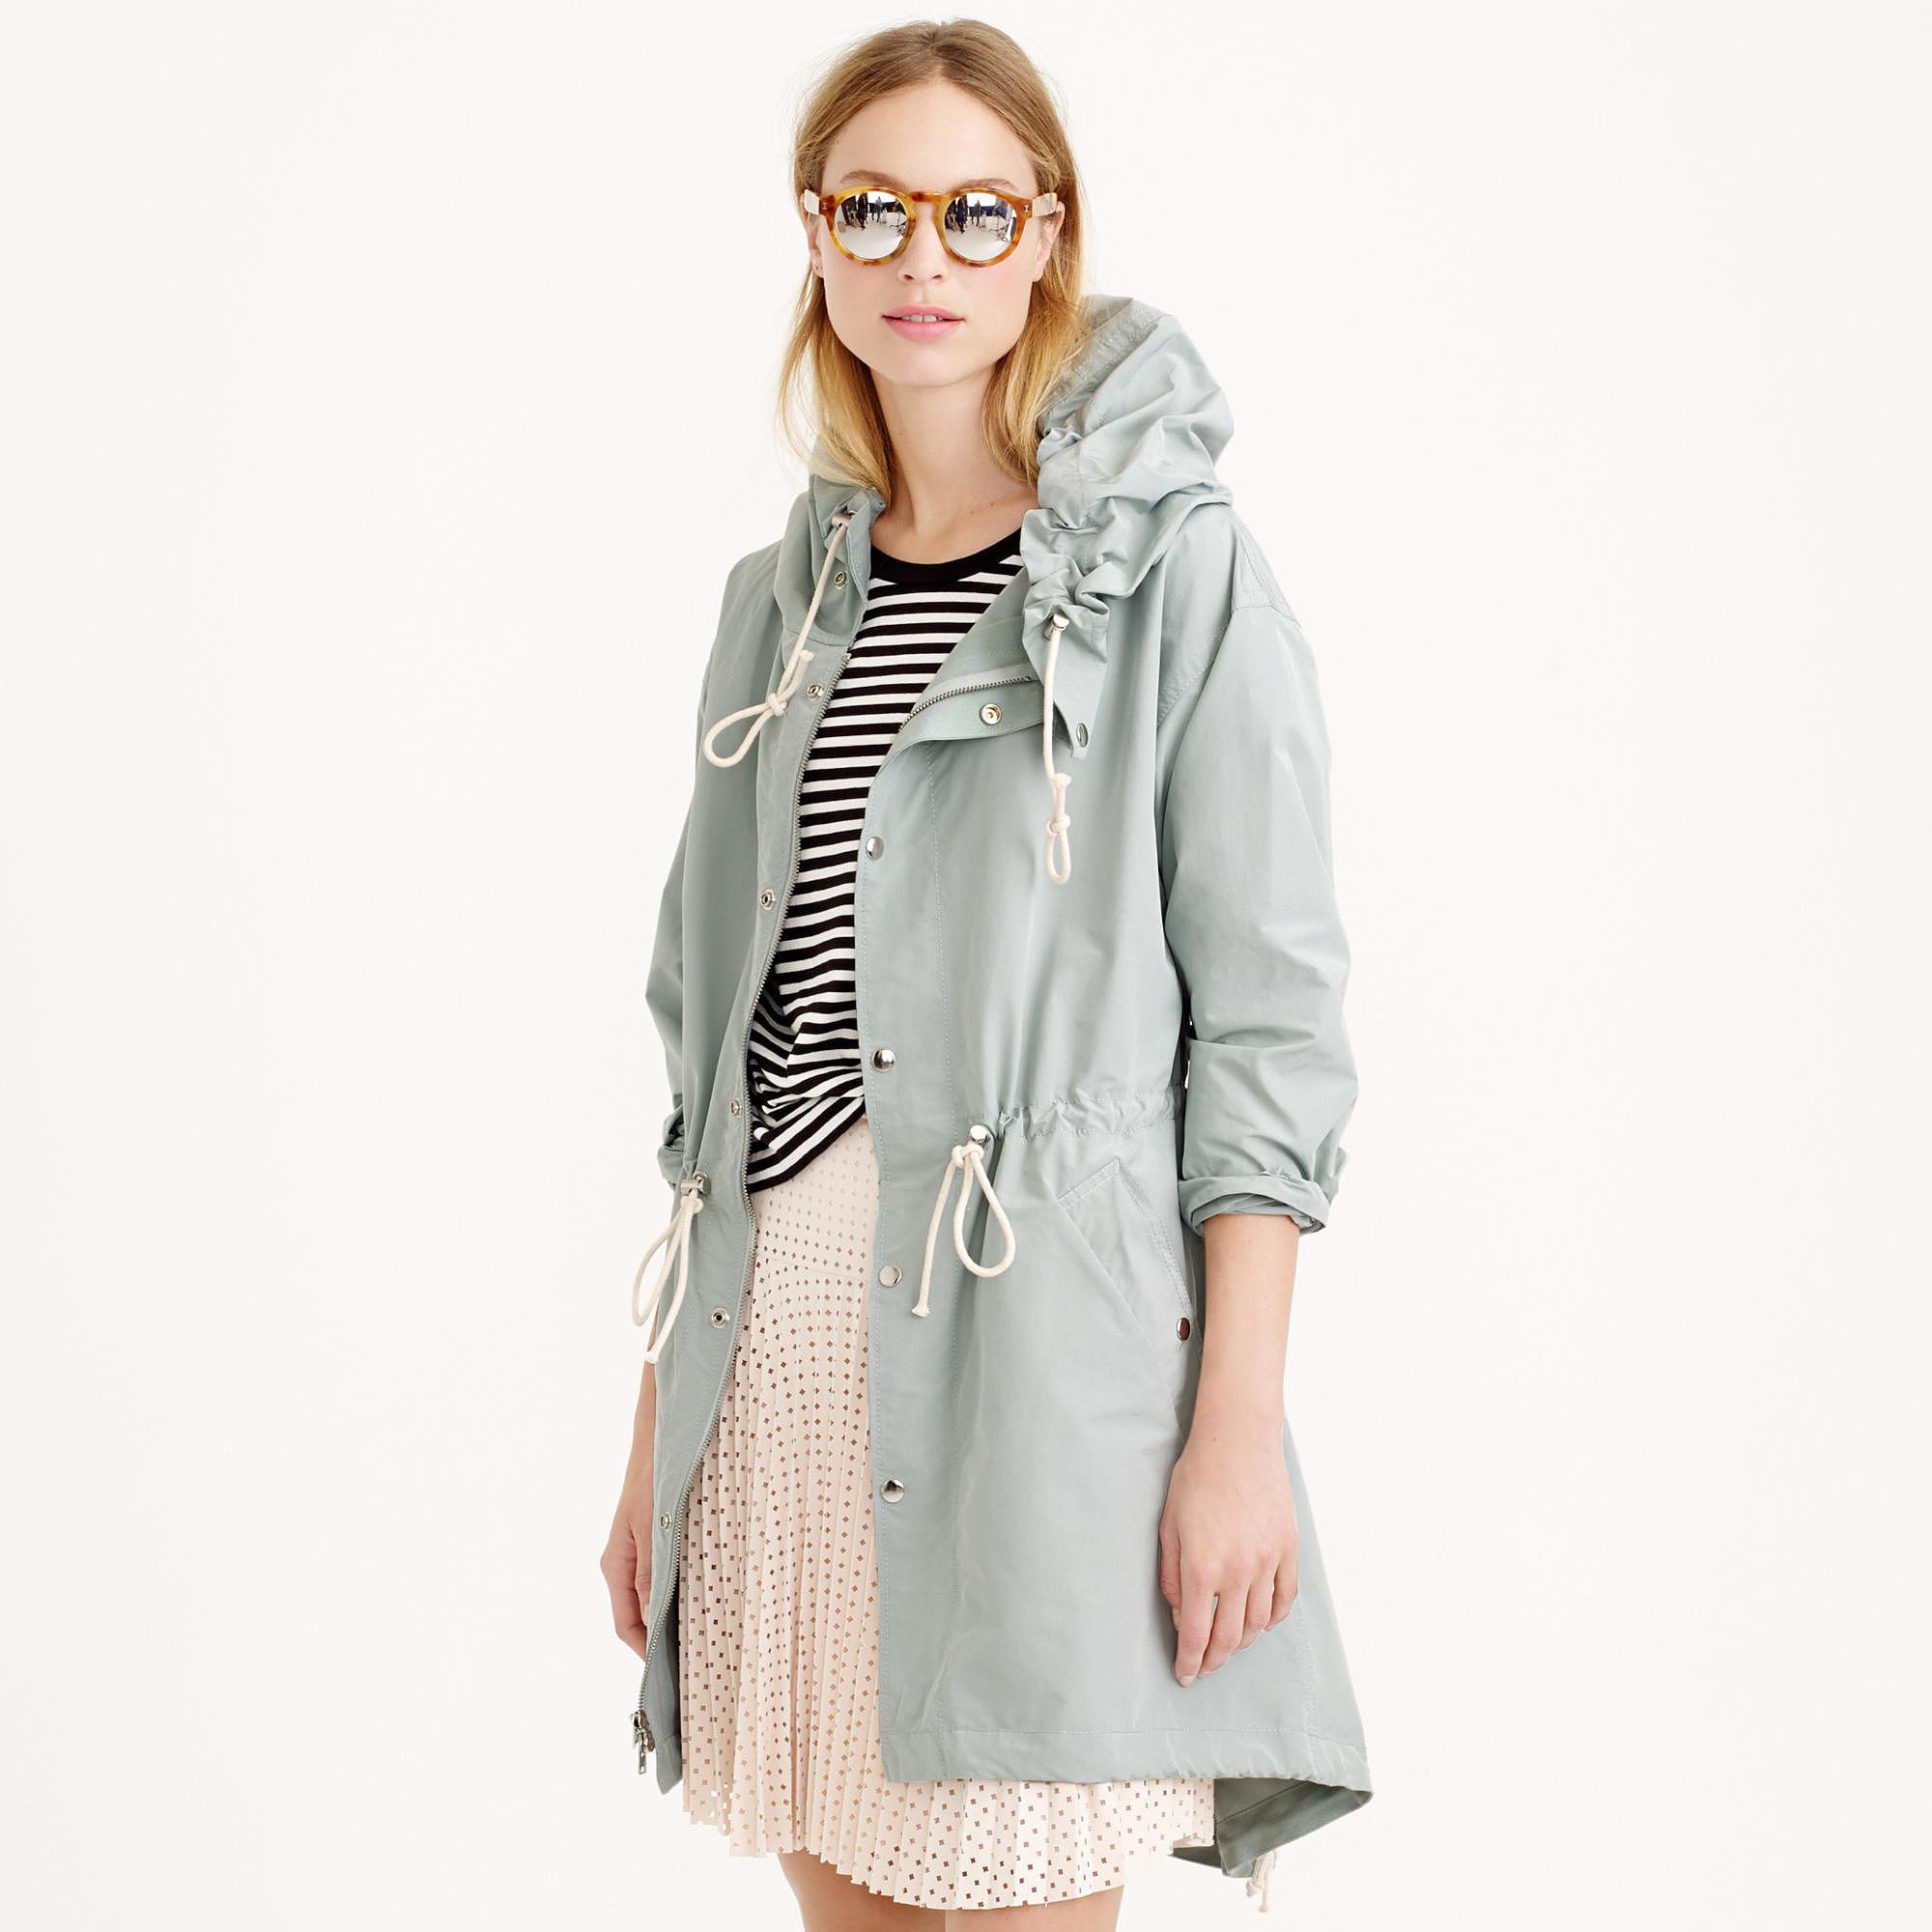 Transitional Spring Coats 2015 | POPSUGAR Fashion